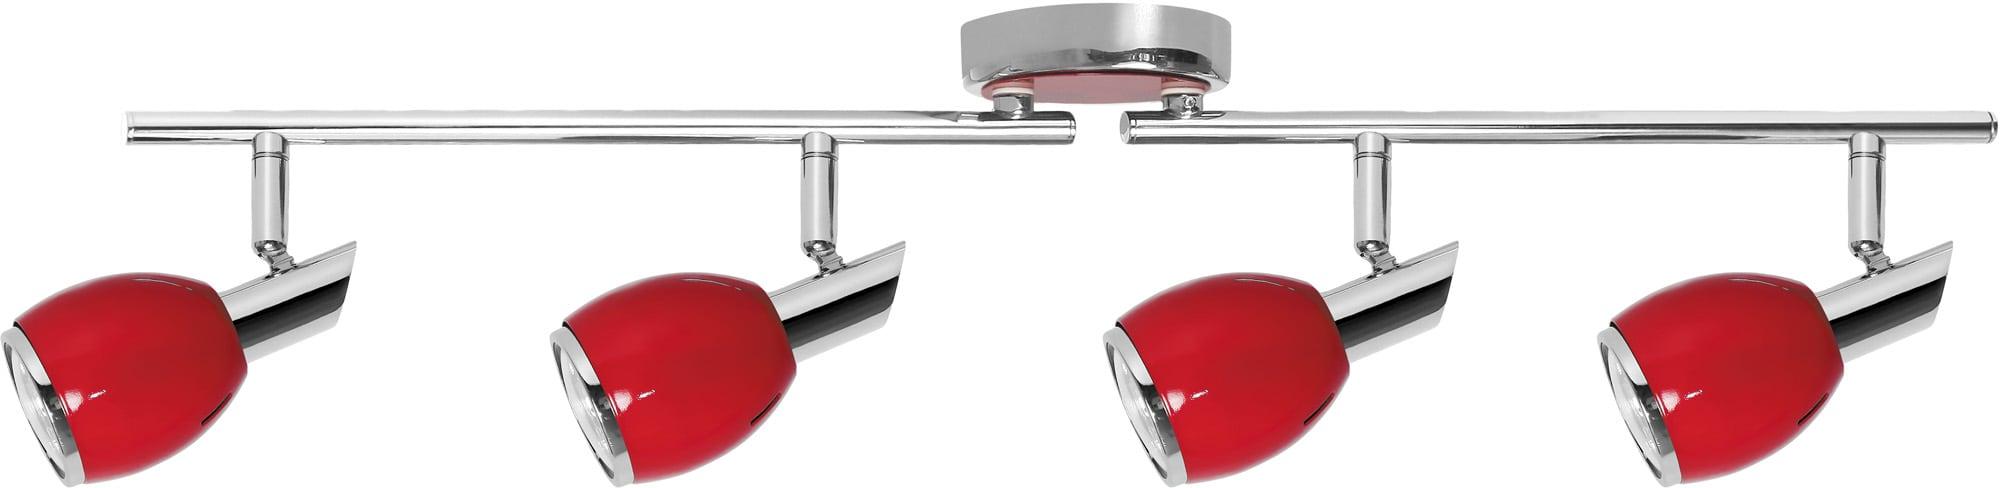 Reflectors Red LED Colors chrome 4x GU10